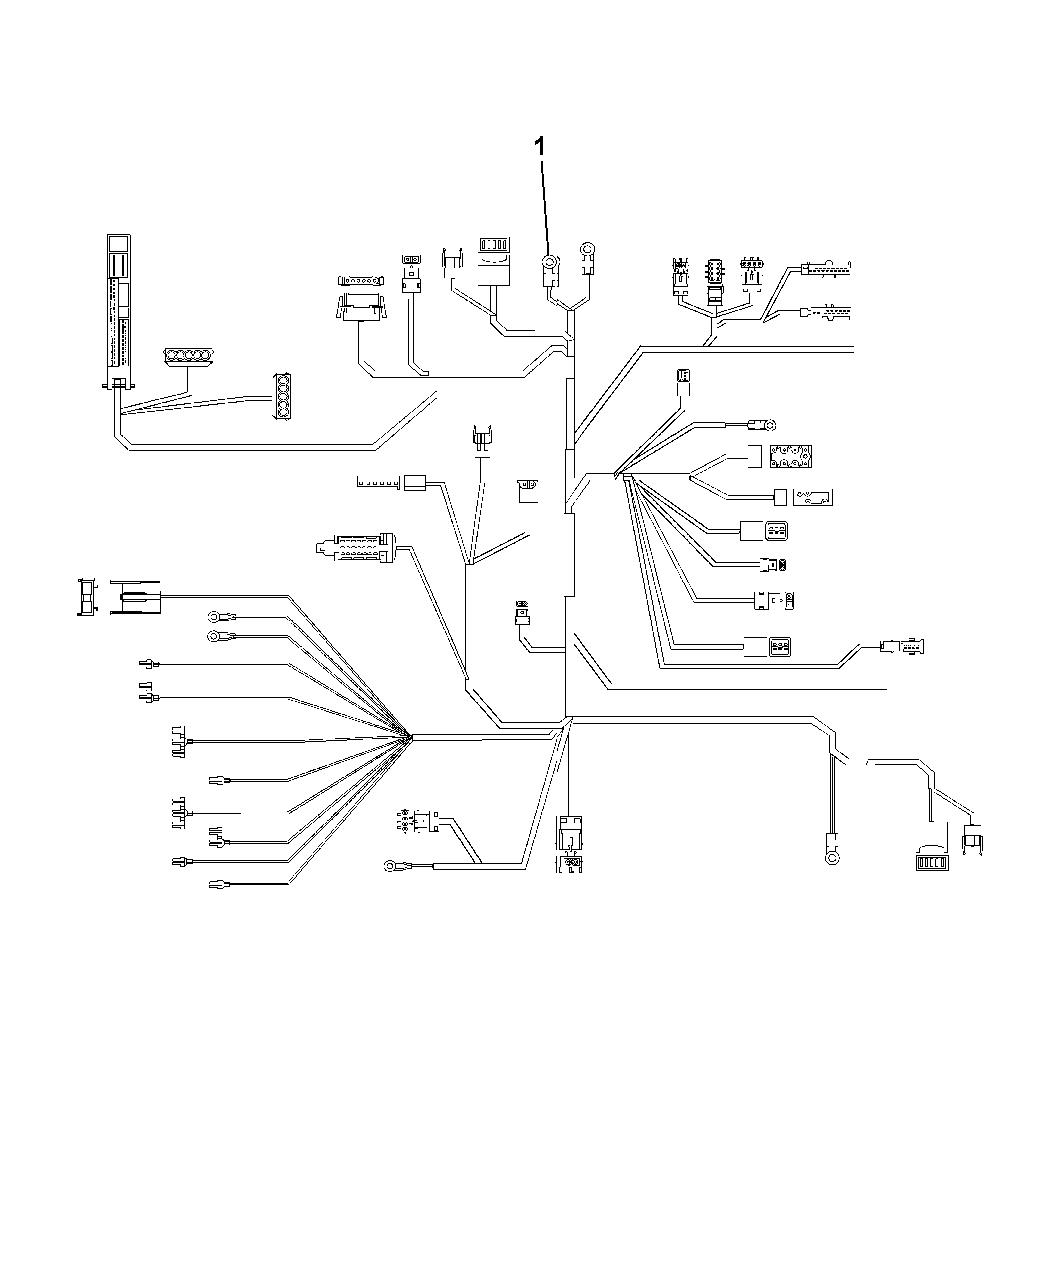 mopar 5142000aa 2005 Mercury Mariner Wiring Diagram